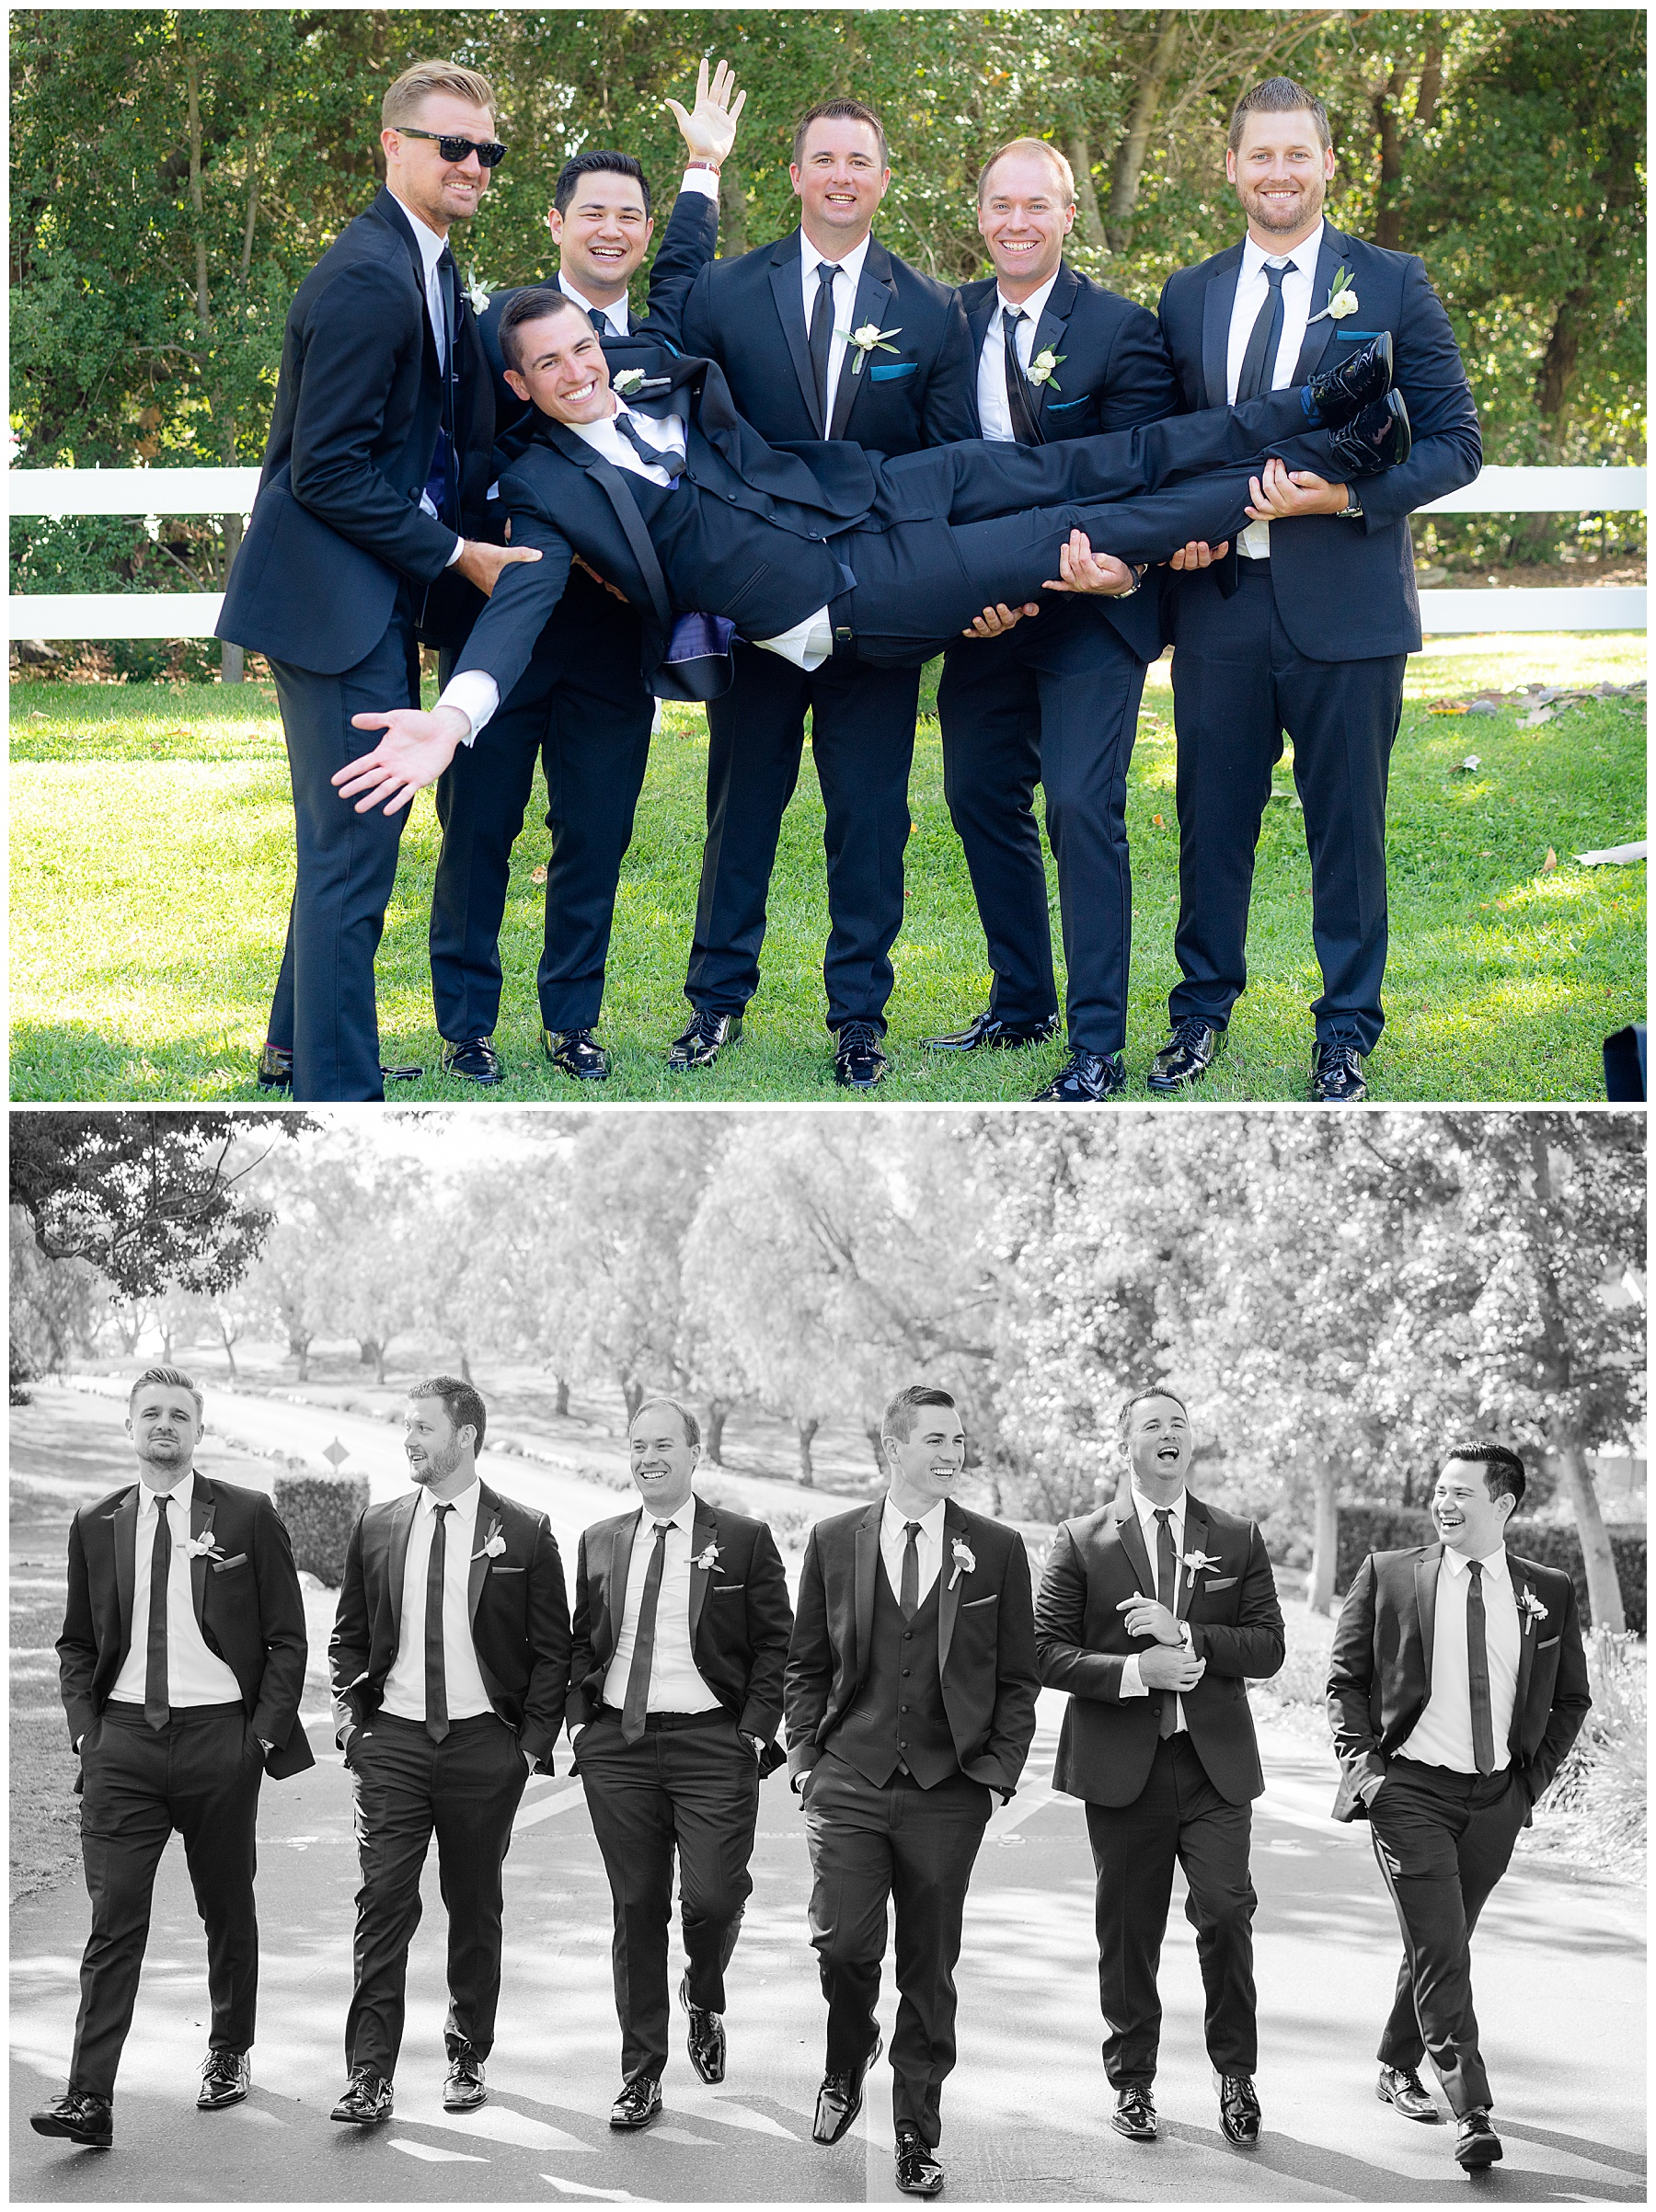 coto valley country club wedding groomsmen